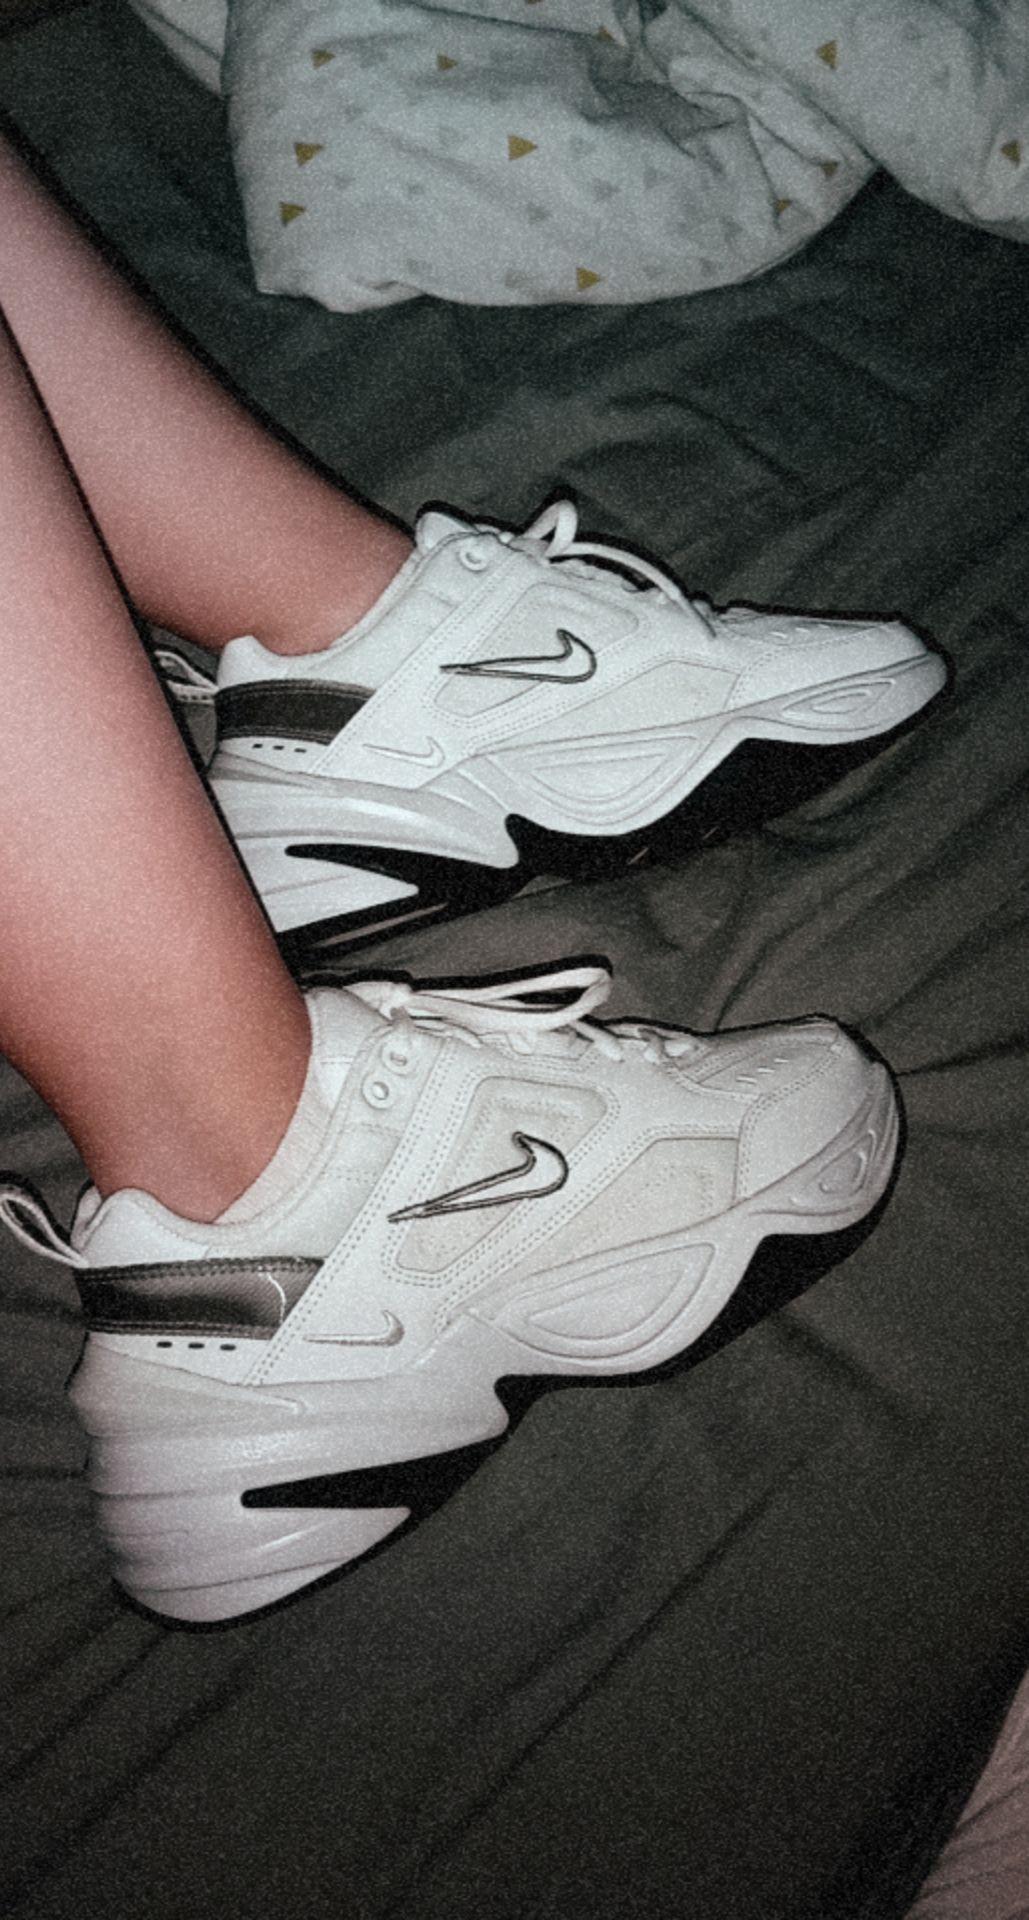 Nike Mk2 Tekno Sneakers Hype Shoes Fresh Shoes